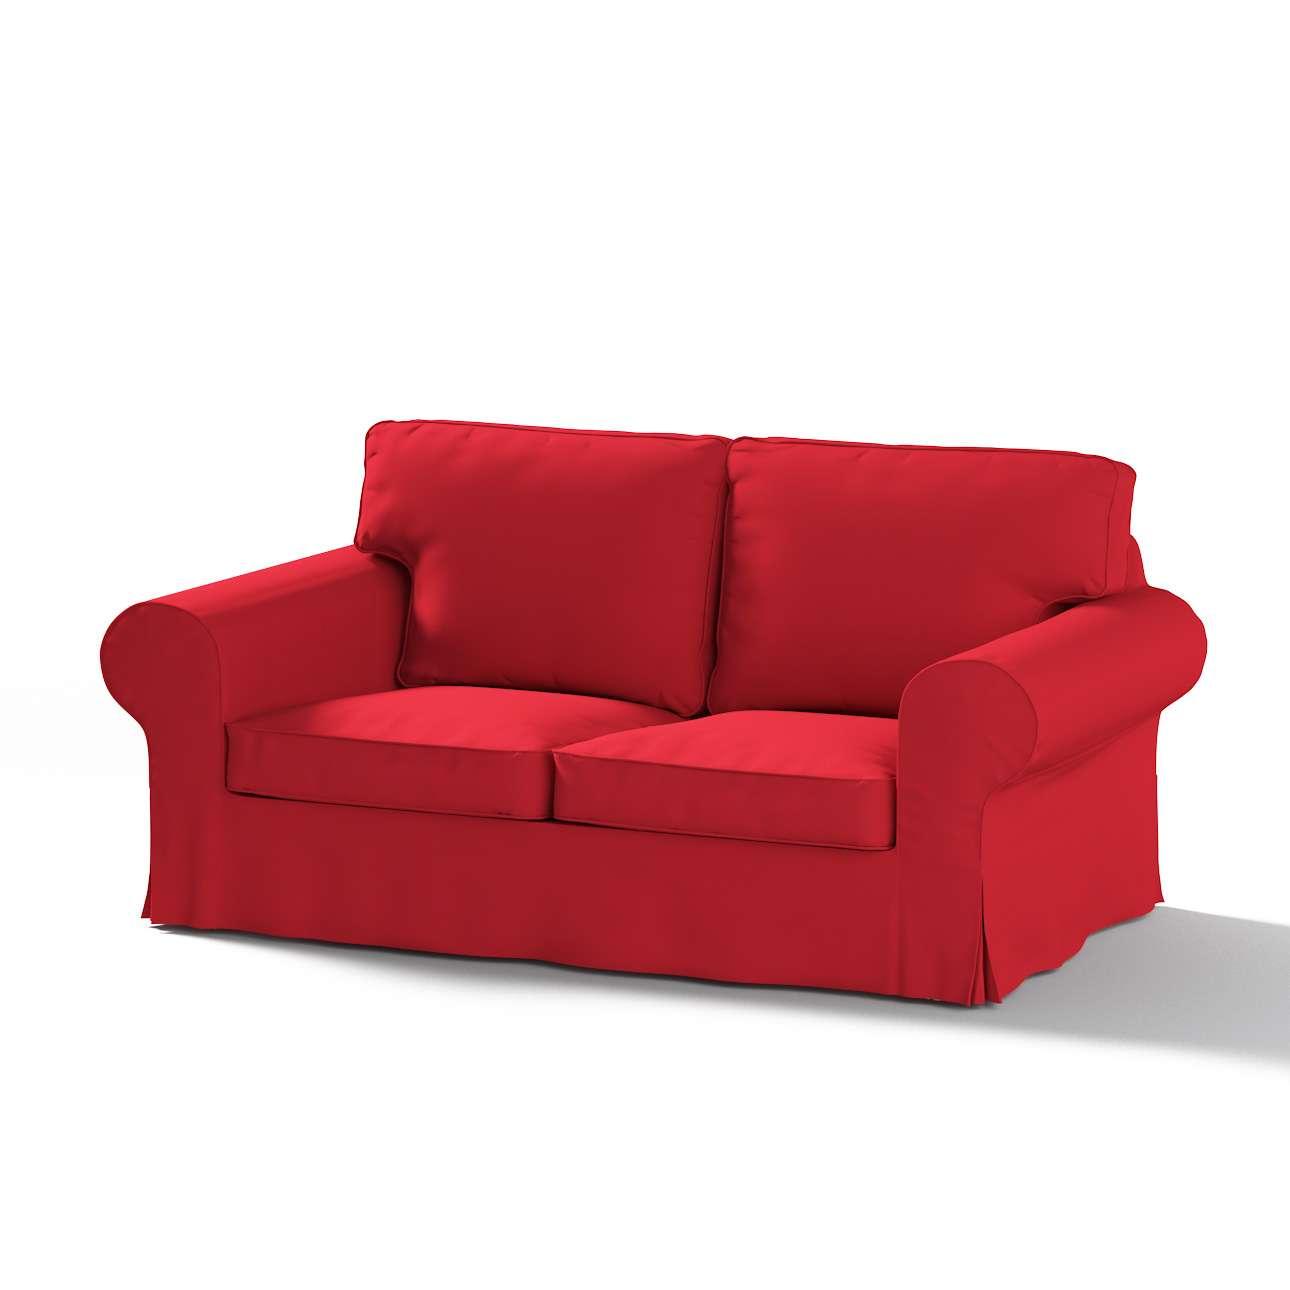 Ektorp 2 sæder sovesofa gammel model<br/>Bredde ca 195cm Betræk uden sofa fra kollektionen Cotton Panama, Stof: 702-04